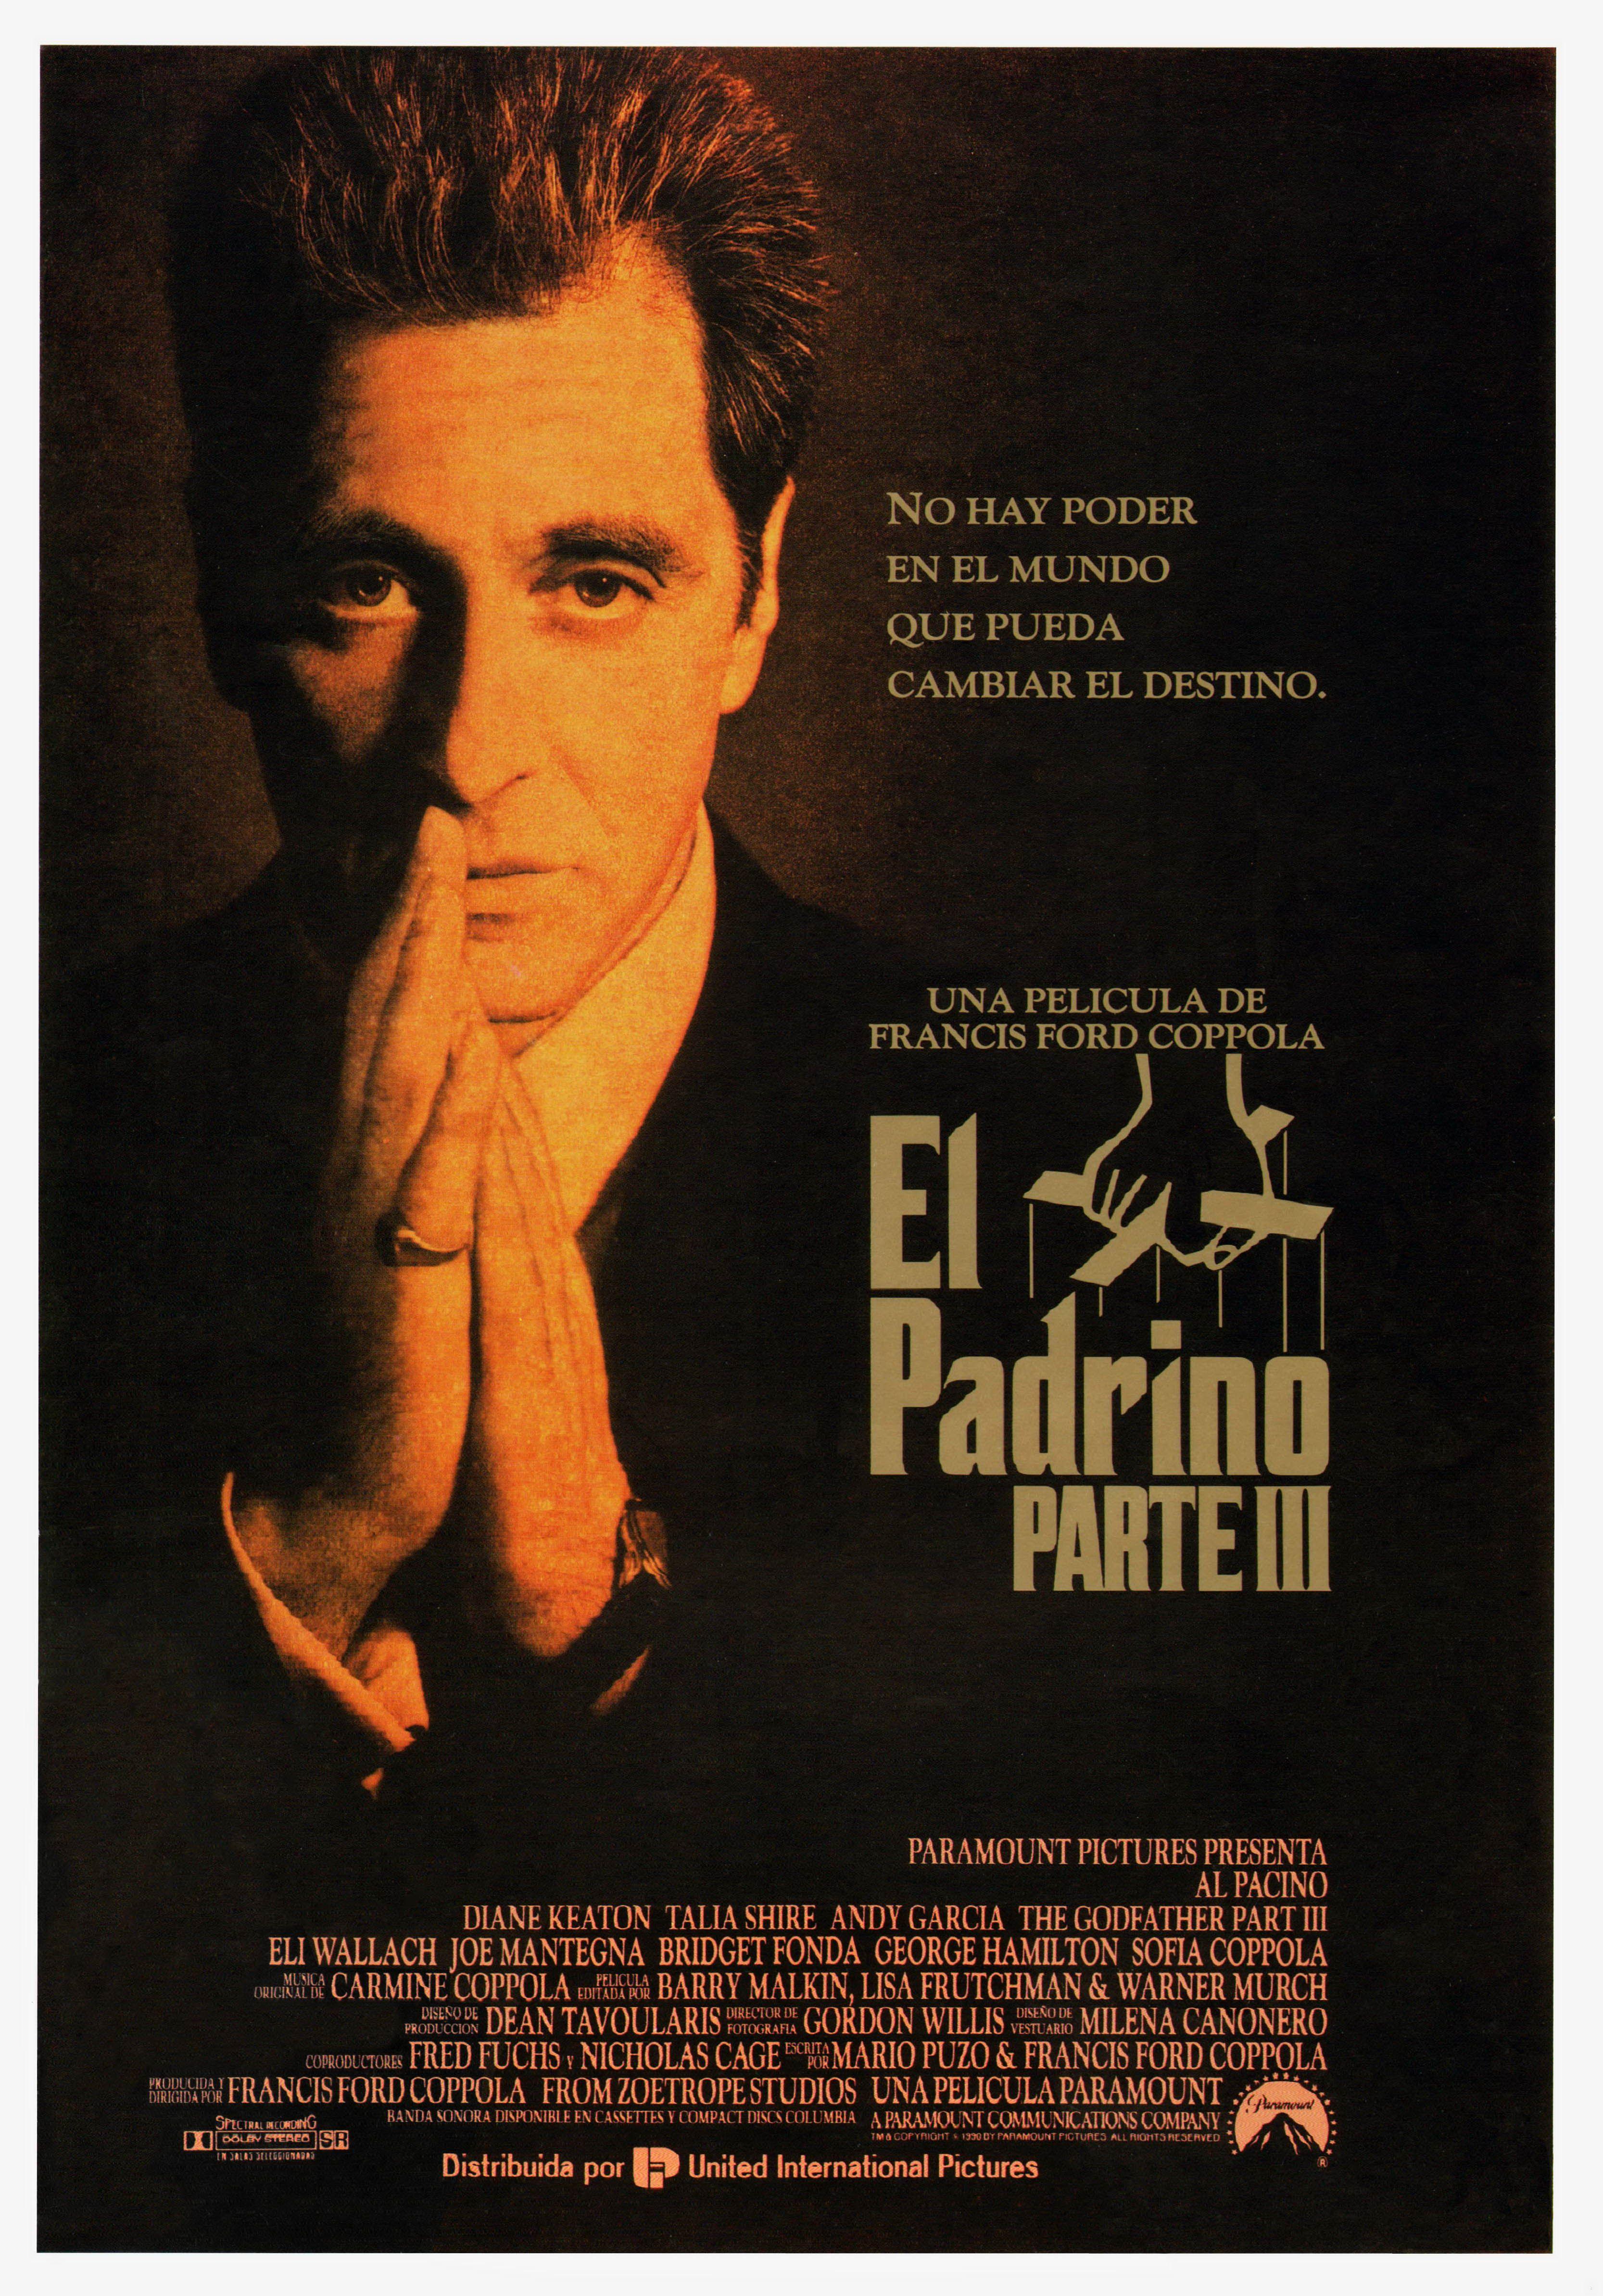 El Padrino Iii The Godfather Part Iii Movie Posters Al